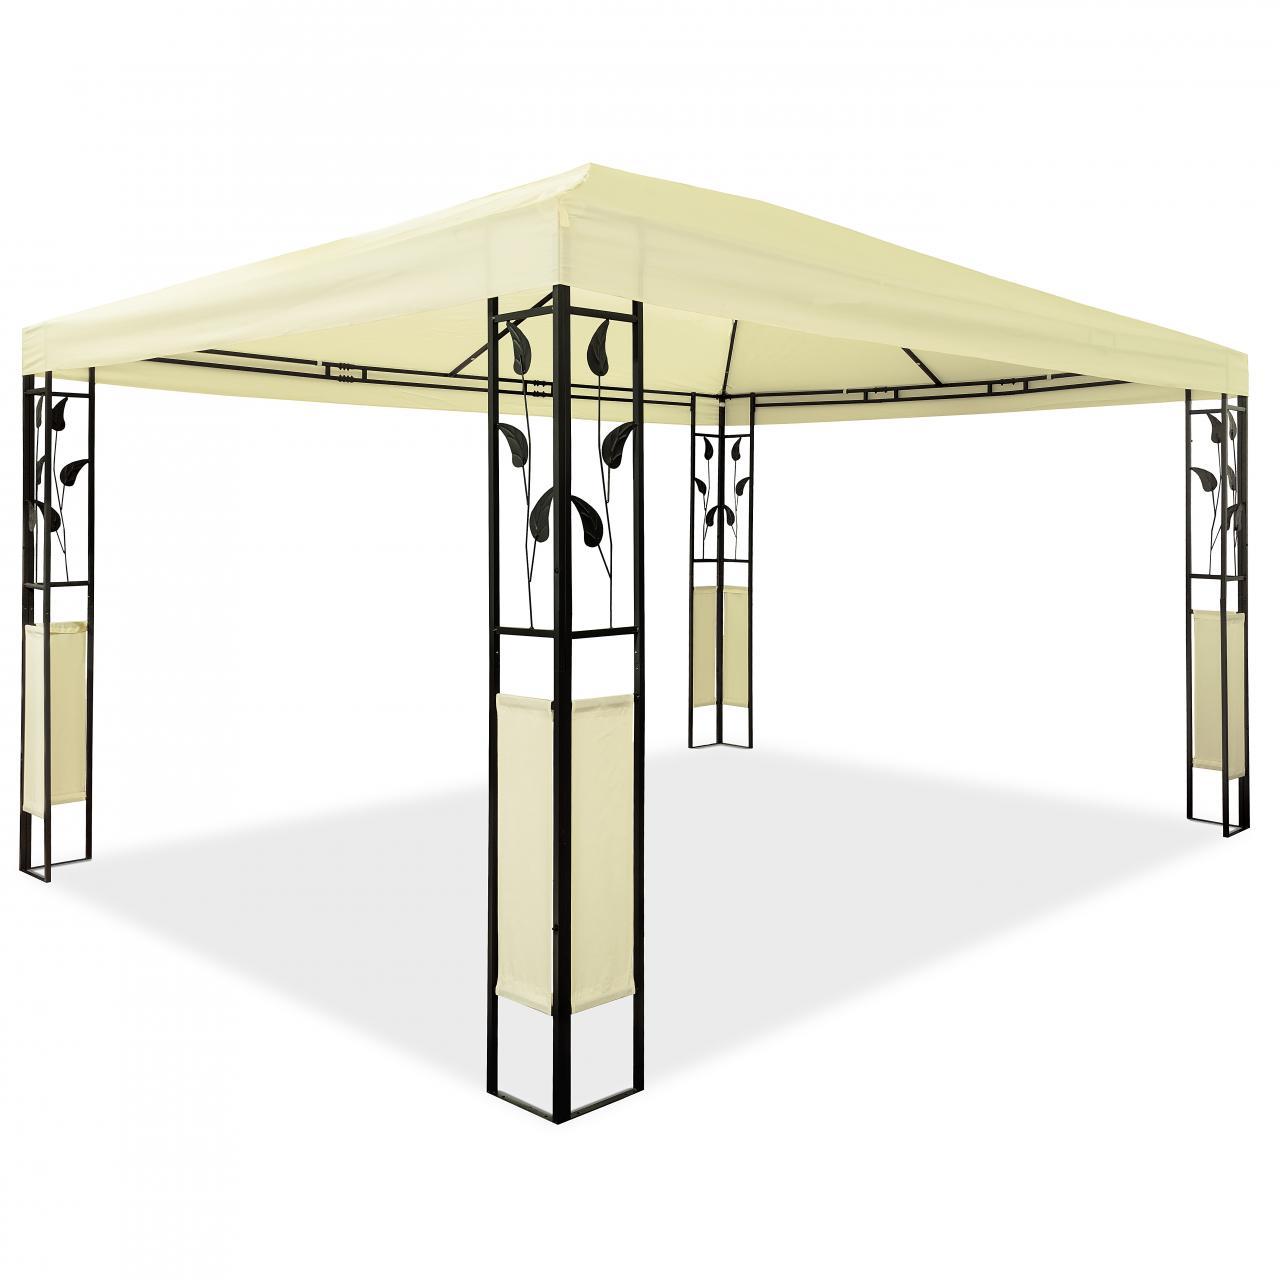 Gartenzelt 3x4 Wasserdicht : Pavillon m design gartenpavillon gartenzelt festzelt